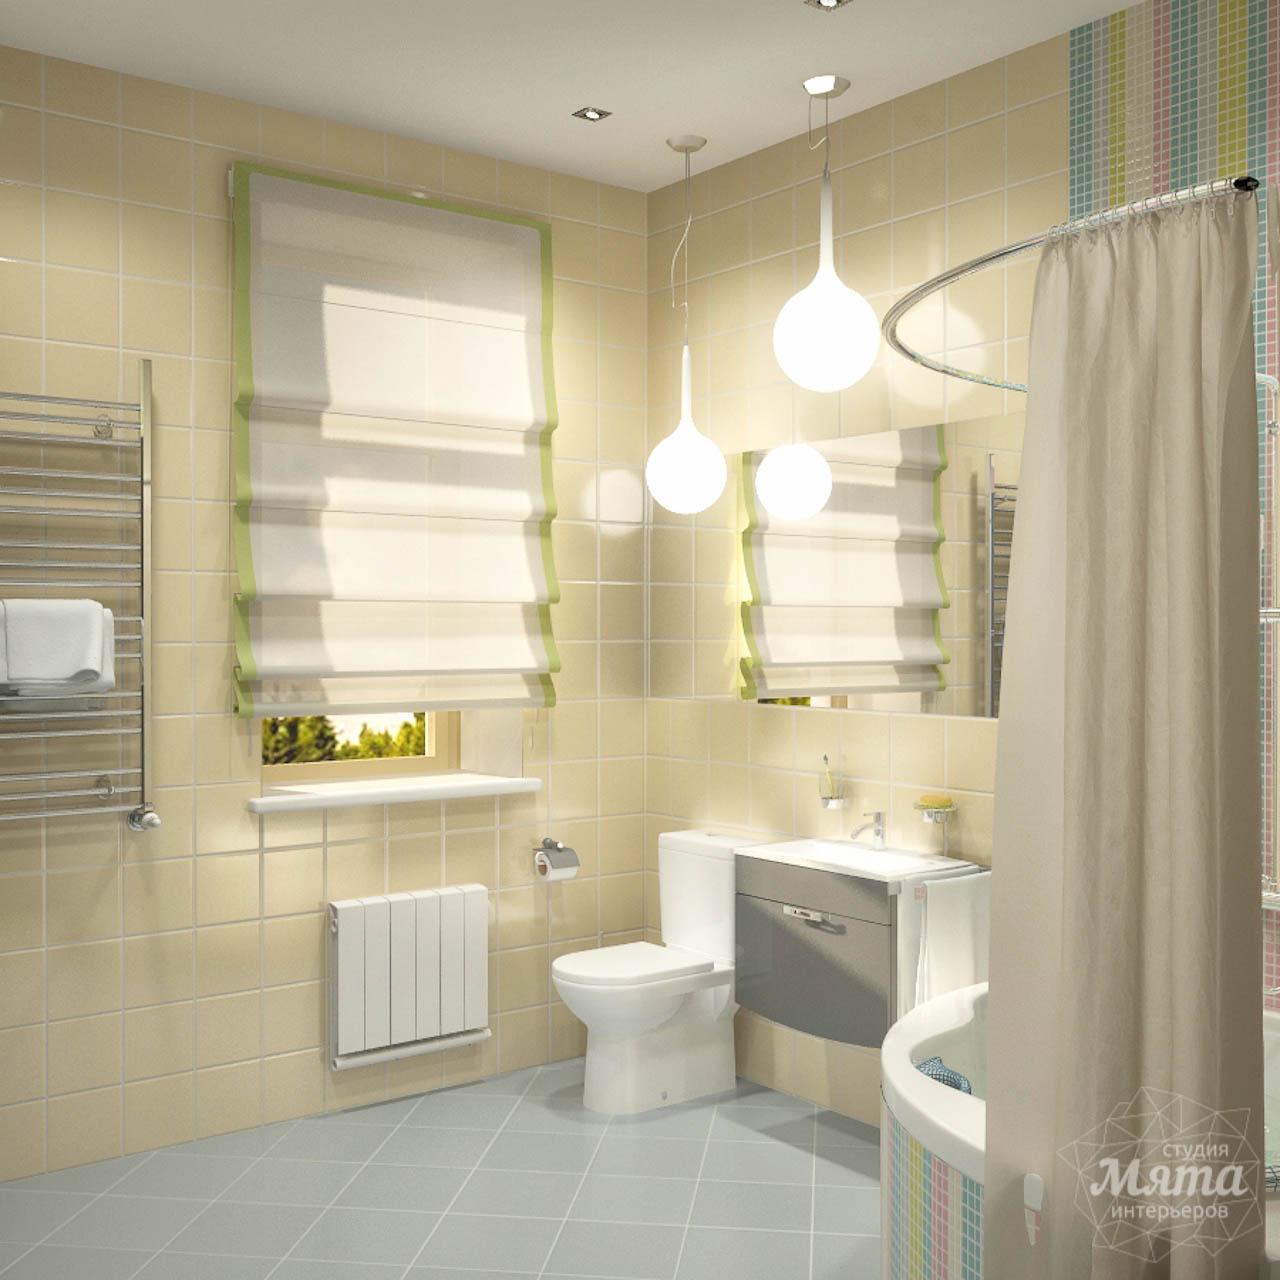 Дизайн проект интерьера коттеджа  в стиле минимализм по ул. Барвинка 15 img1683531379